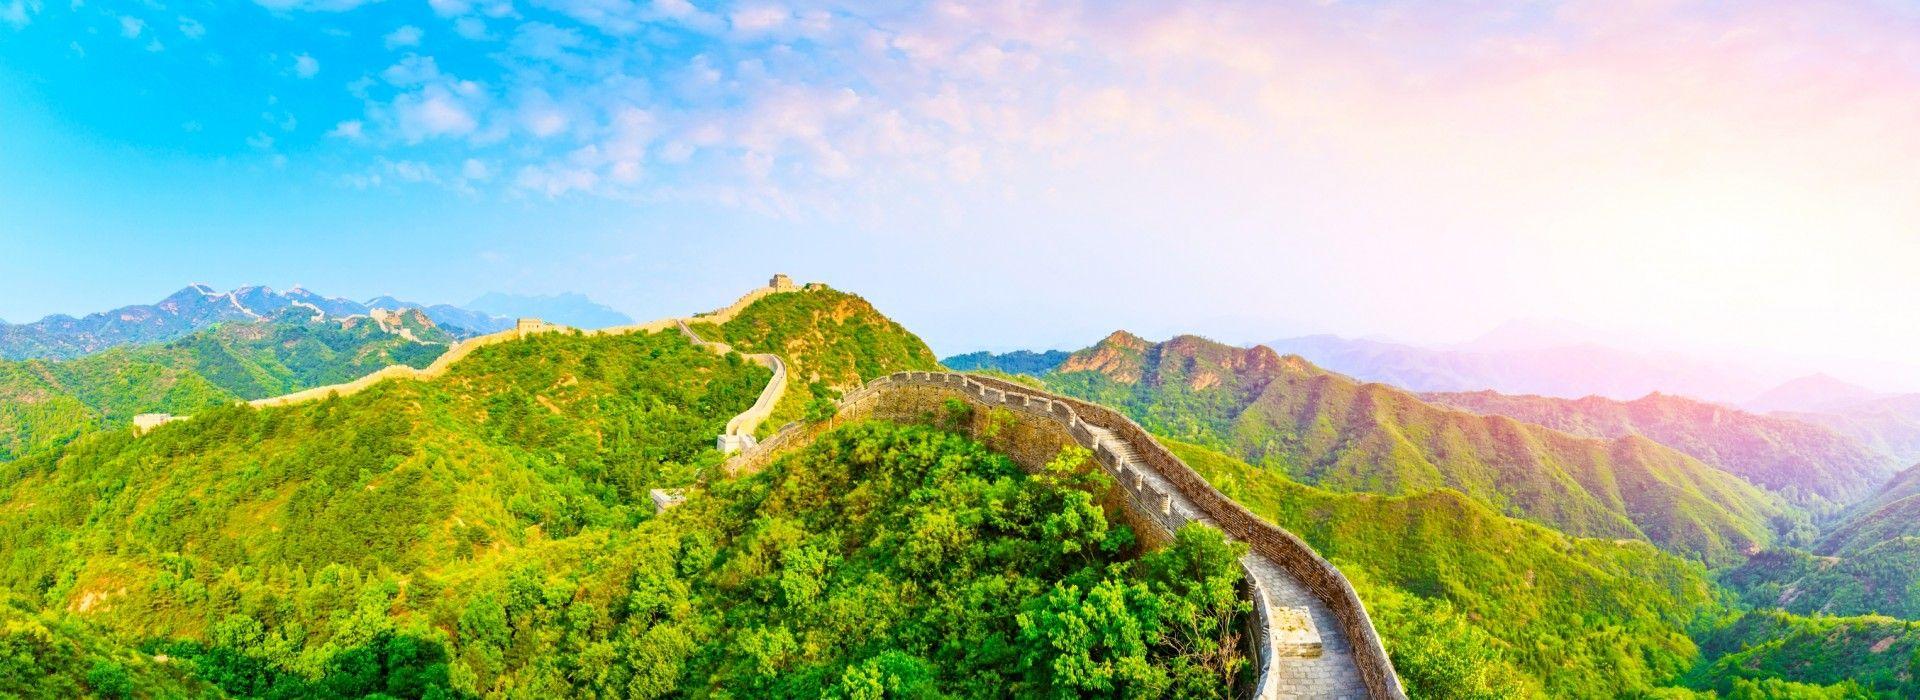 China Tours and Trips to China